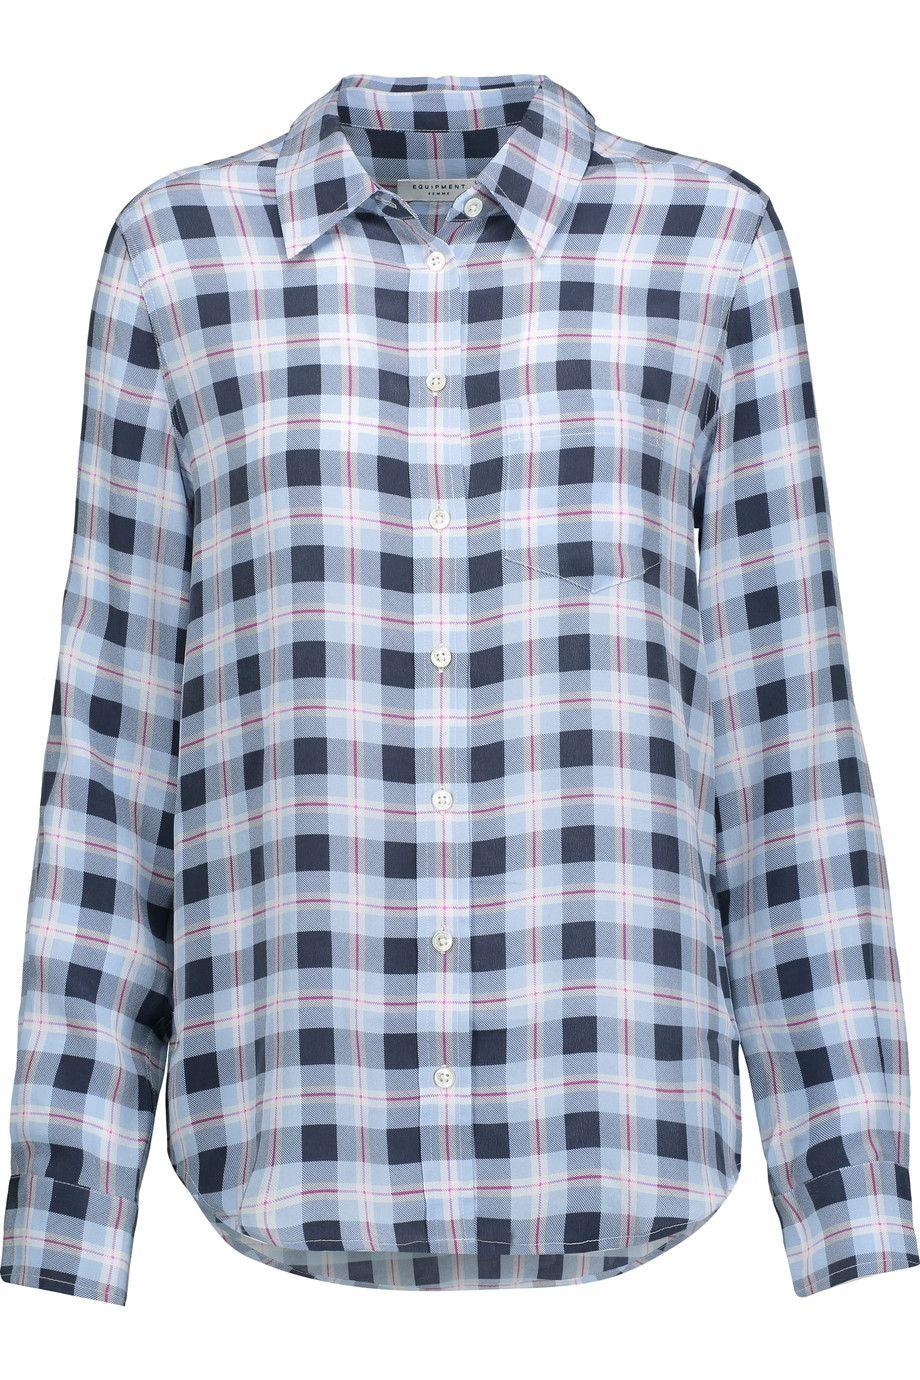 b36d11cb03f256 Equipment Silk Shirt Sale - BCD Tofu House